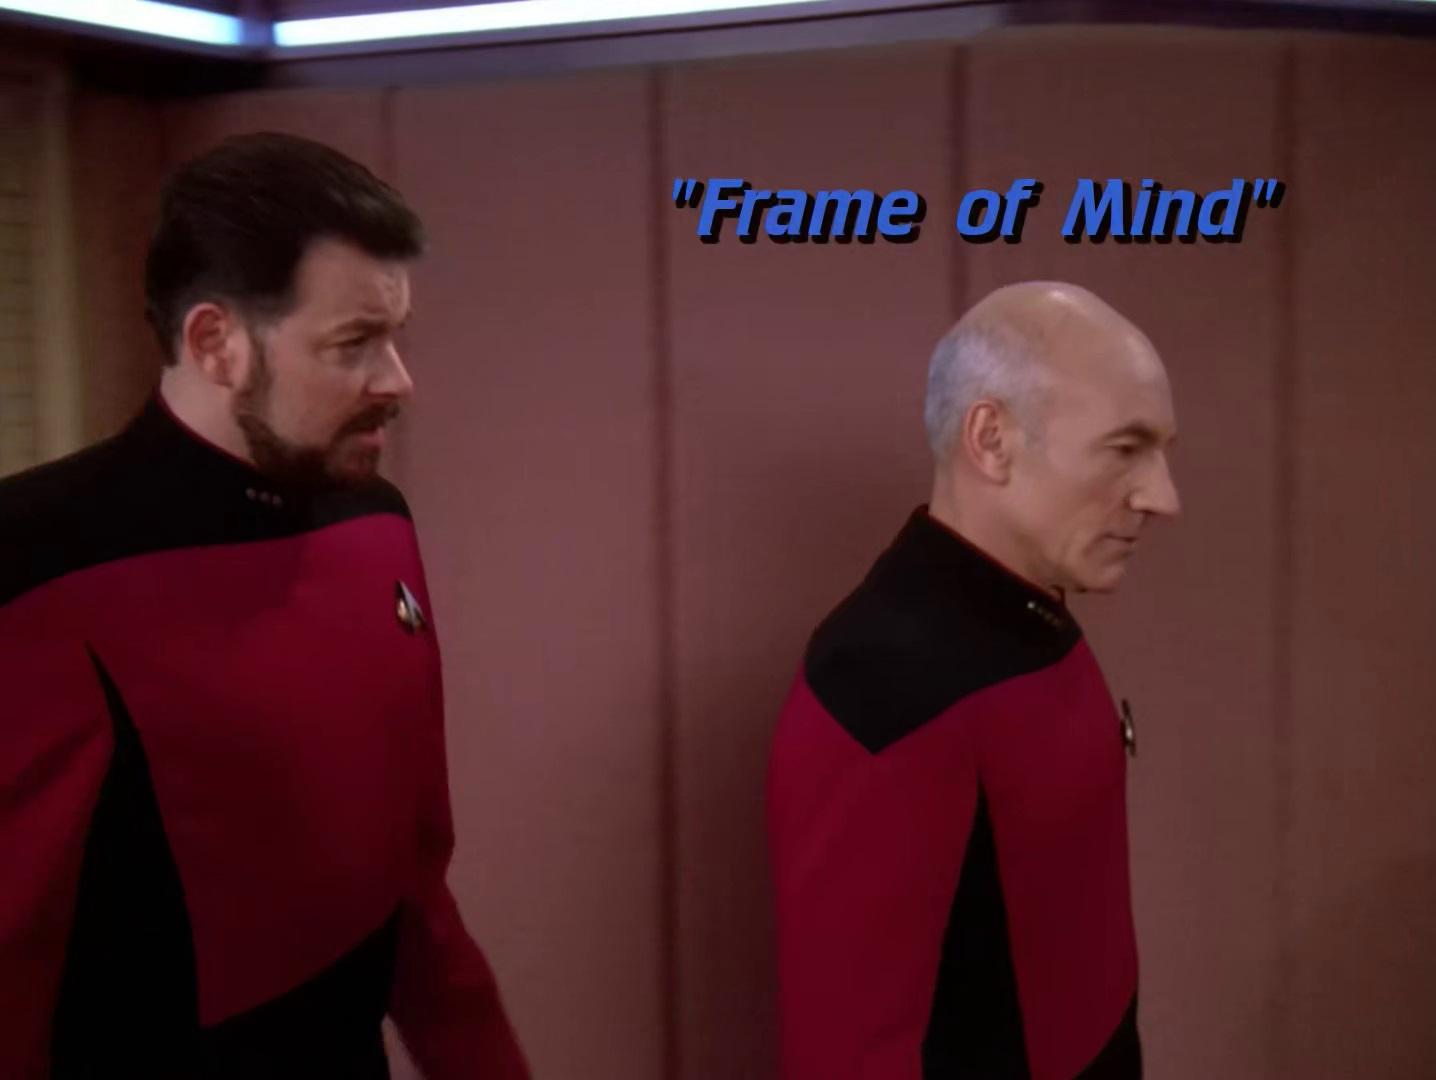 Frame of Mind (episode) | Memory Alpha | FANDOM powered by Wikia